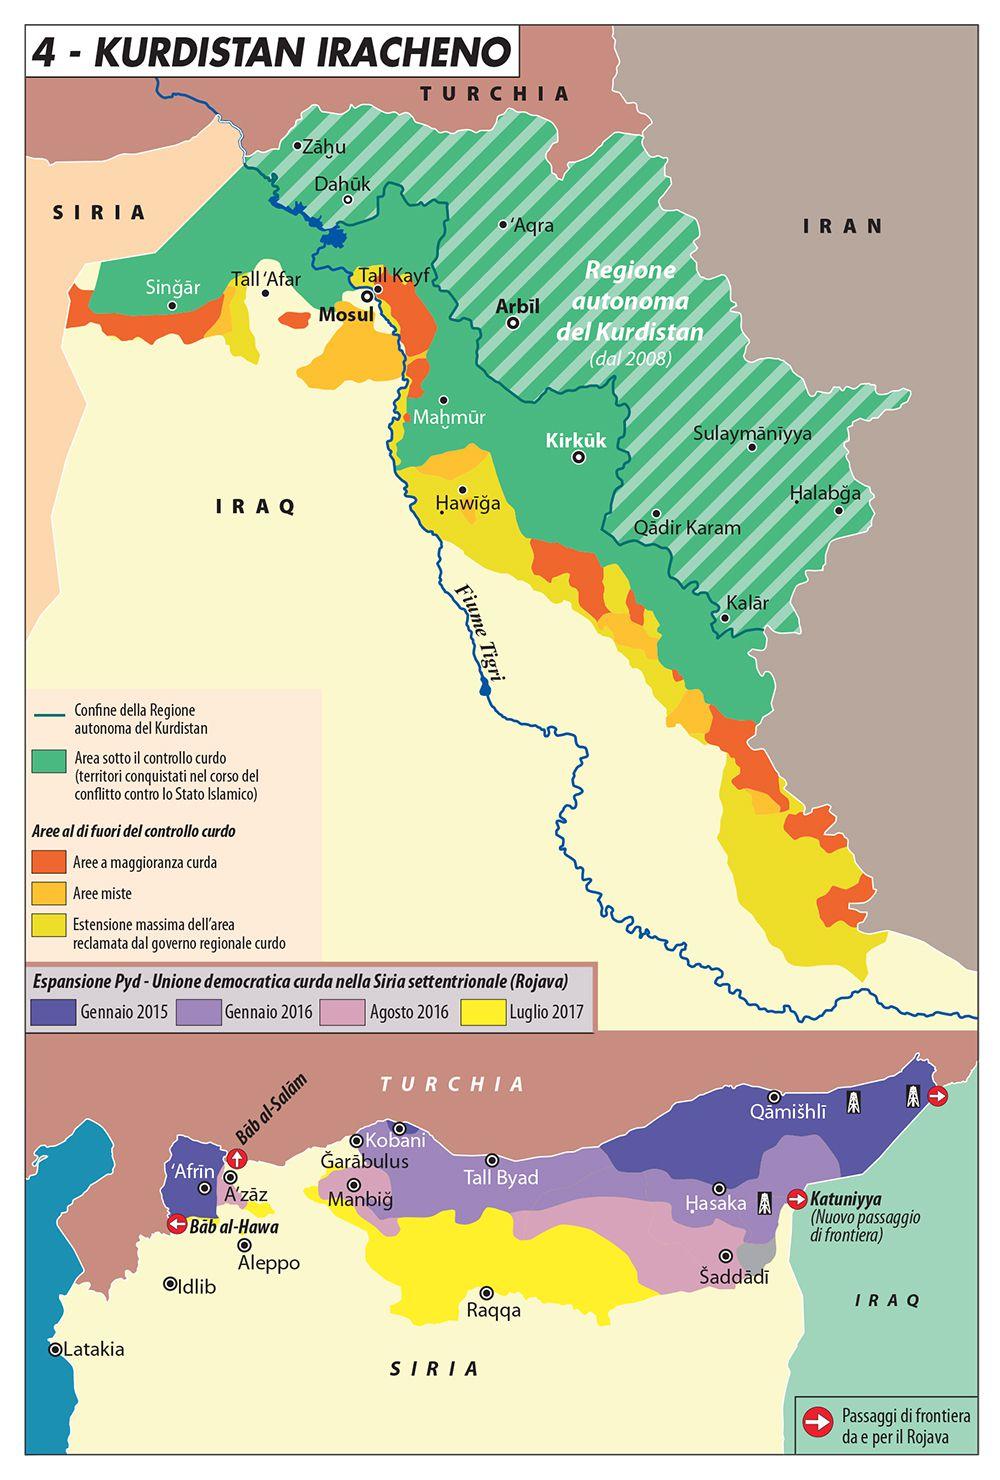 kurdistan_iracheno_717